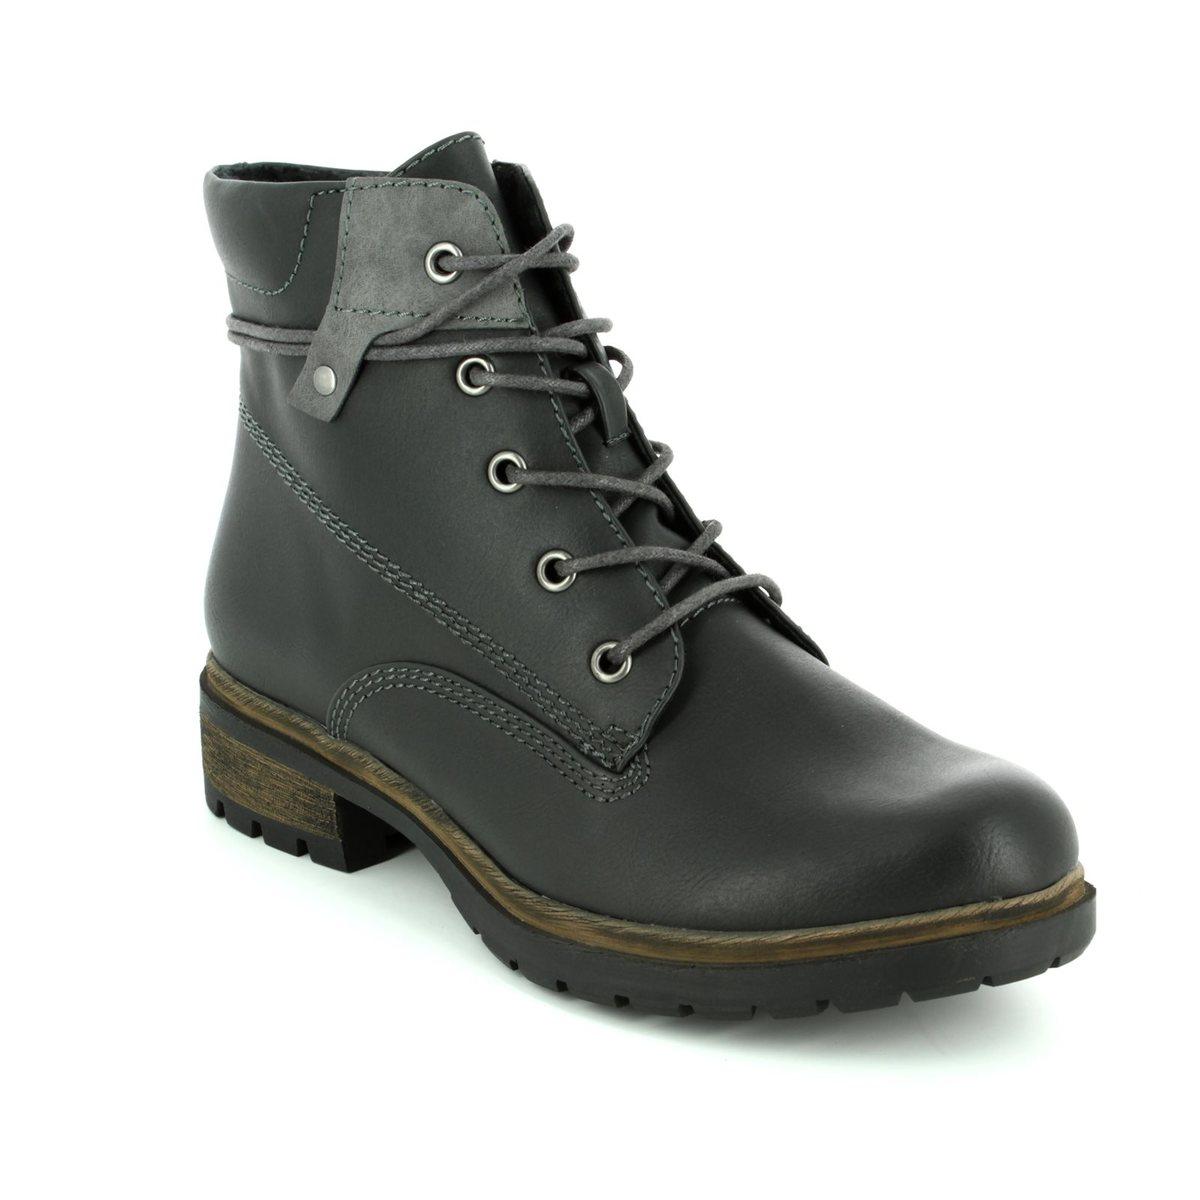 9c013ead2af Tamaris Ankle Boots - Black - 25117 001 HELIOSIN